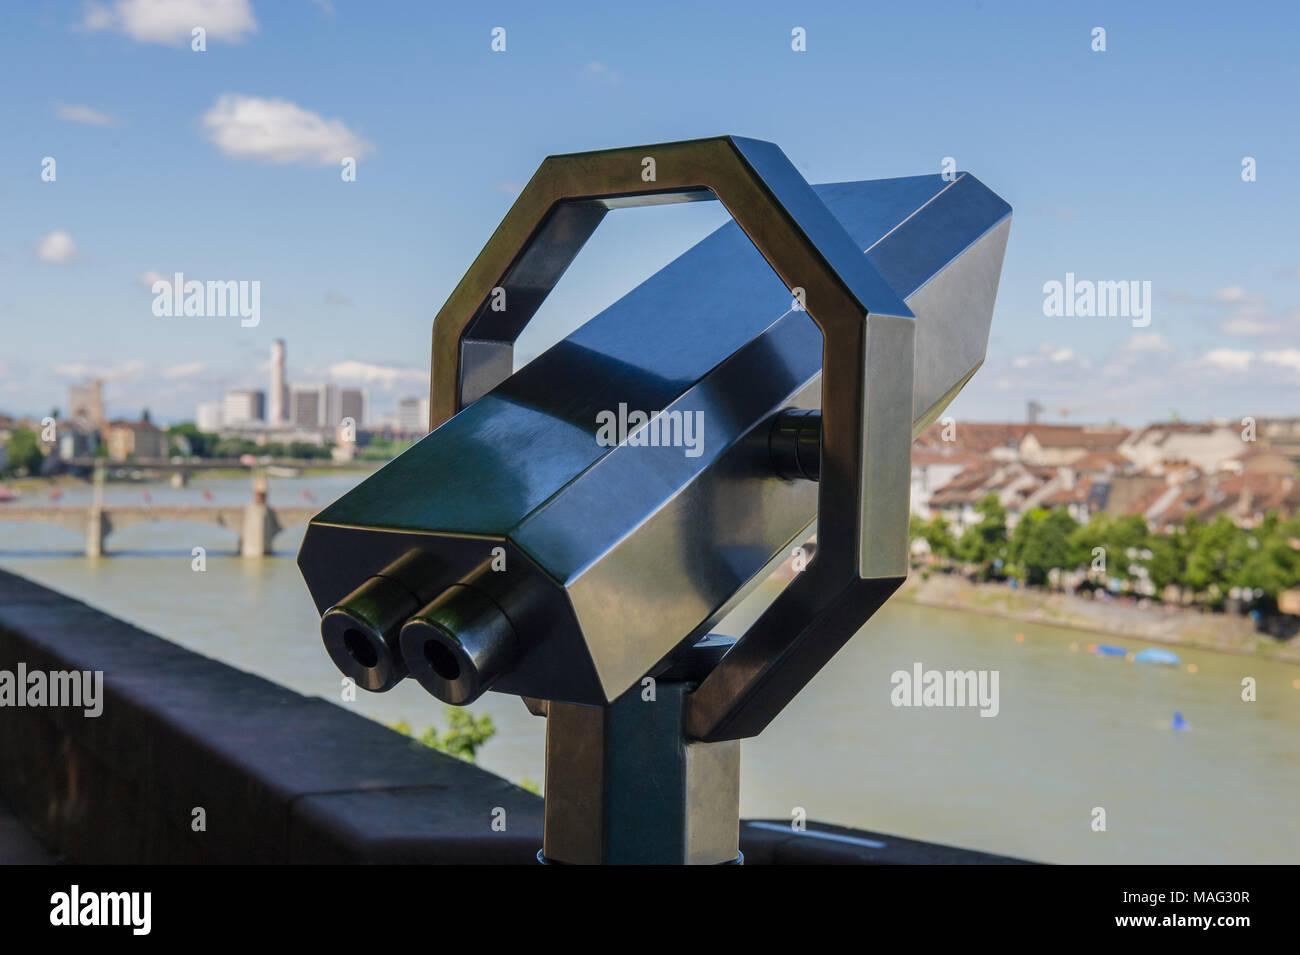 BASEL, SWITZERLAND - JUNE 04 2017: telescope against the backdrop of the city of Basel. Switzerland. Europe. - Stock Image